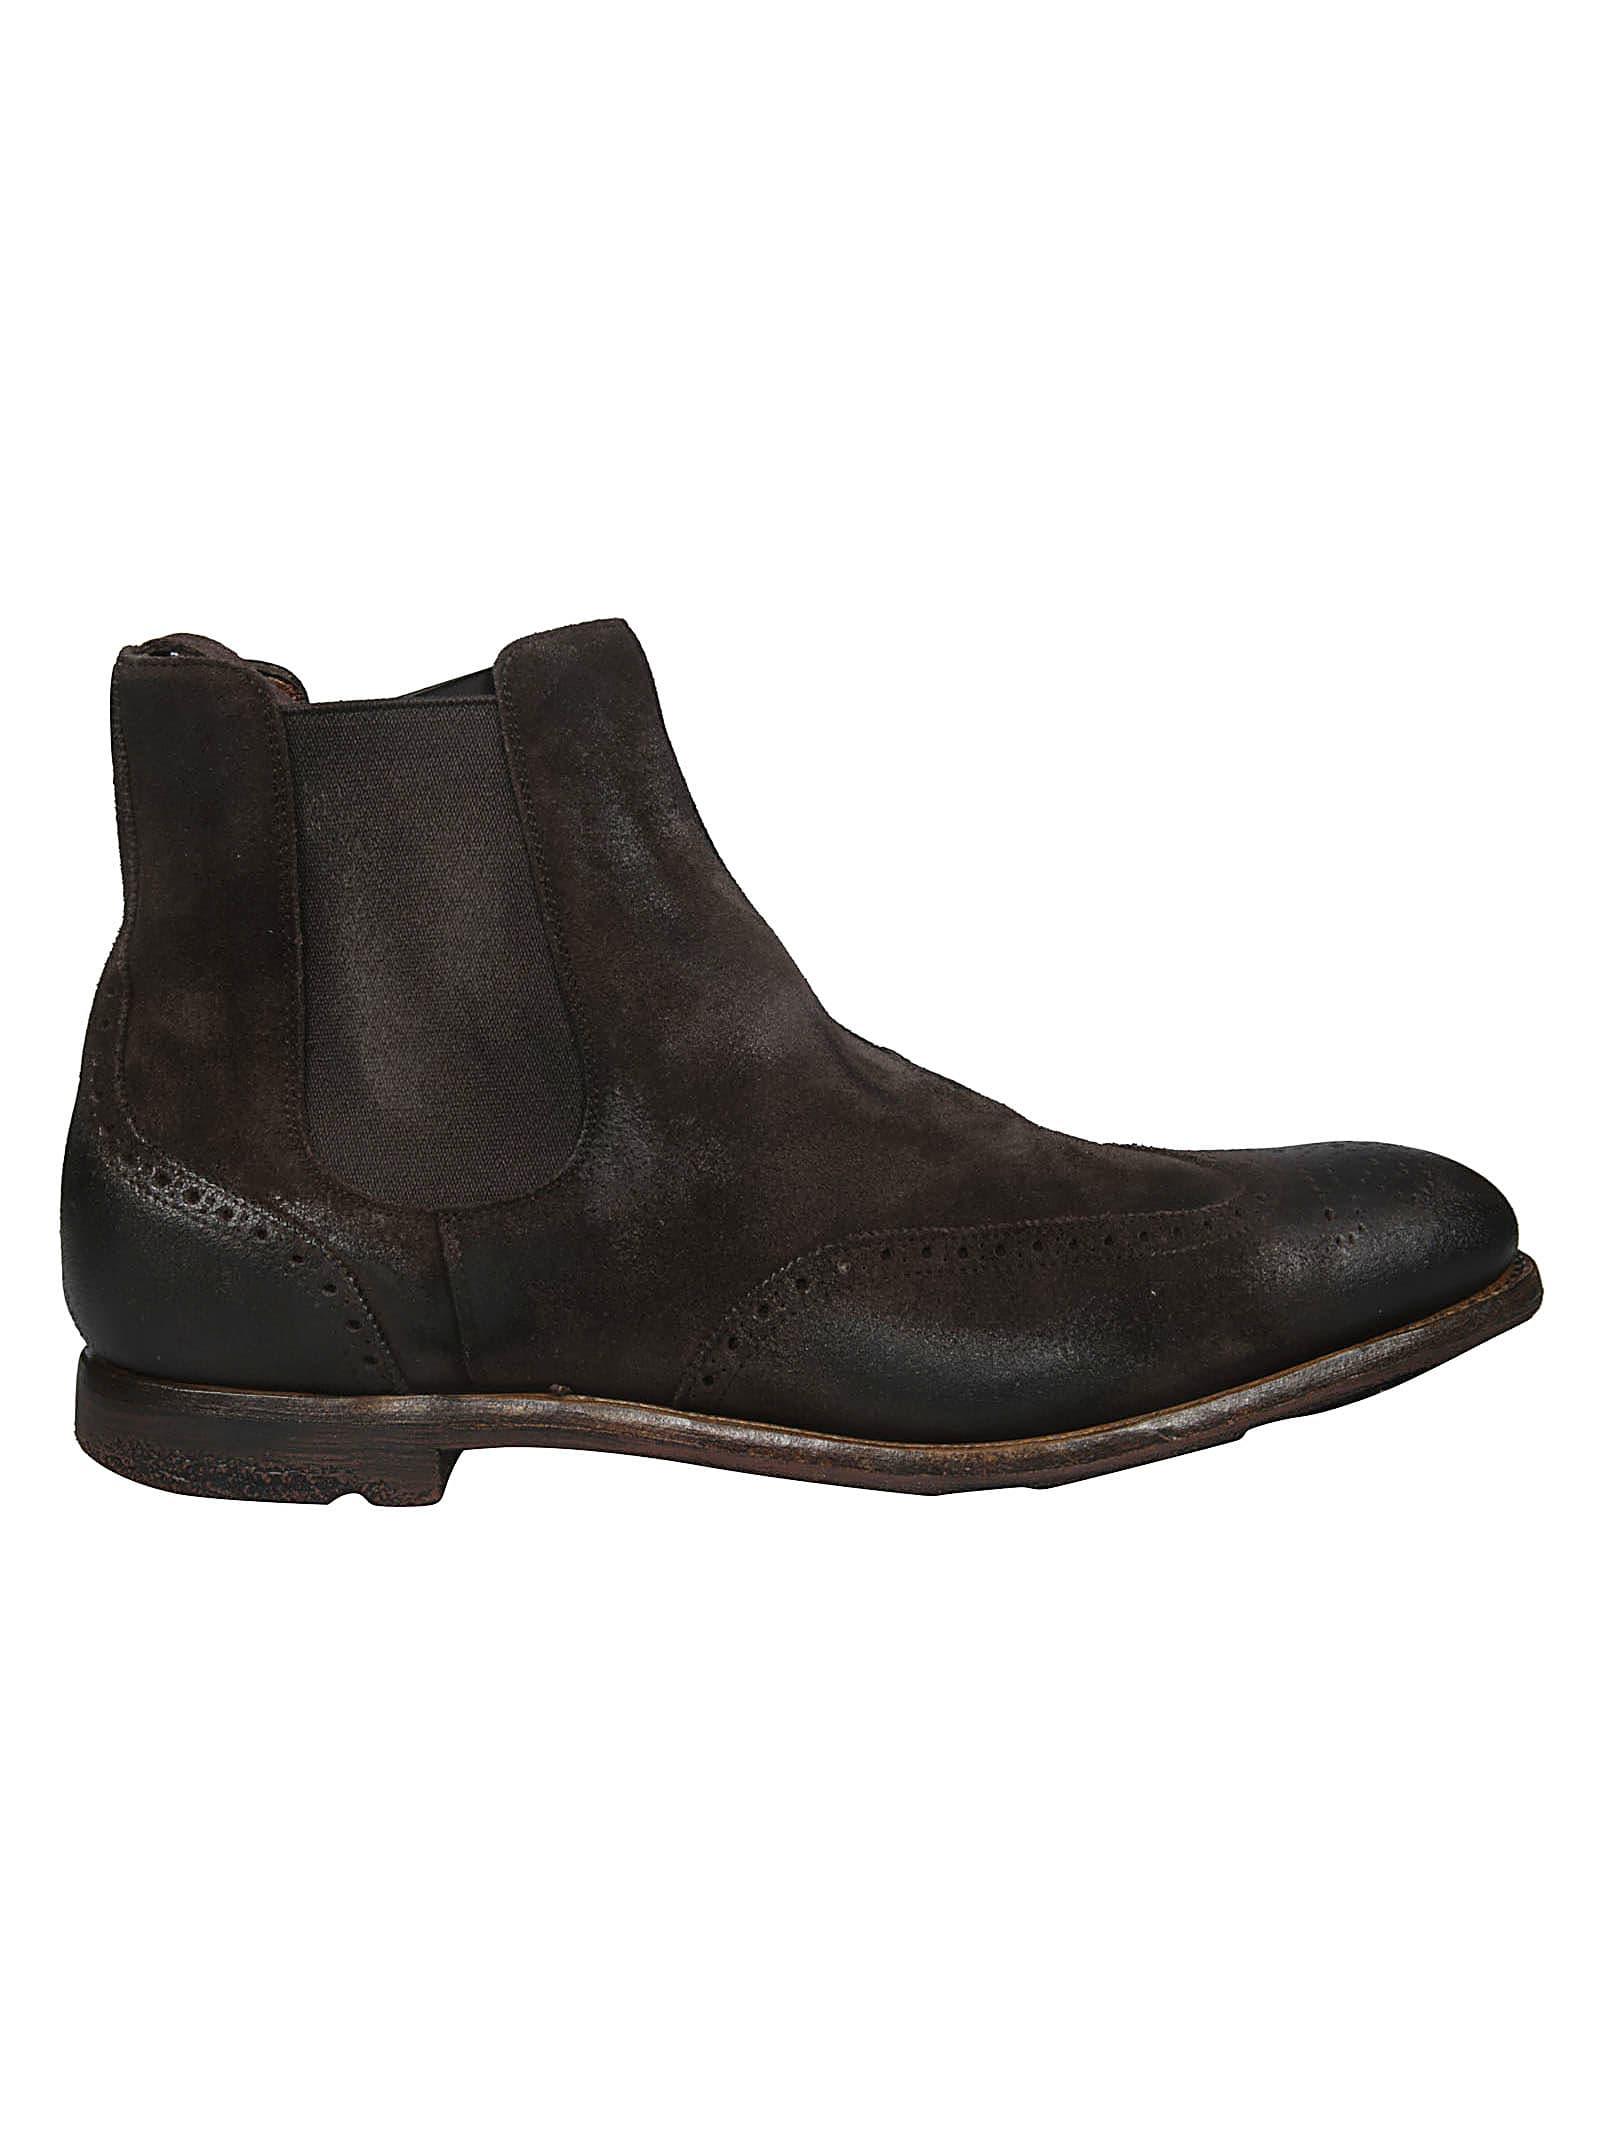 Churchs Vintage Ankle Boots